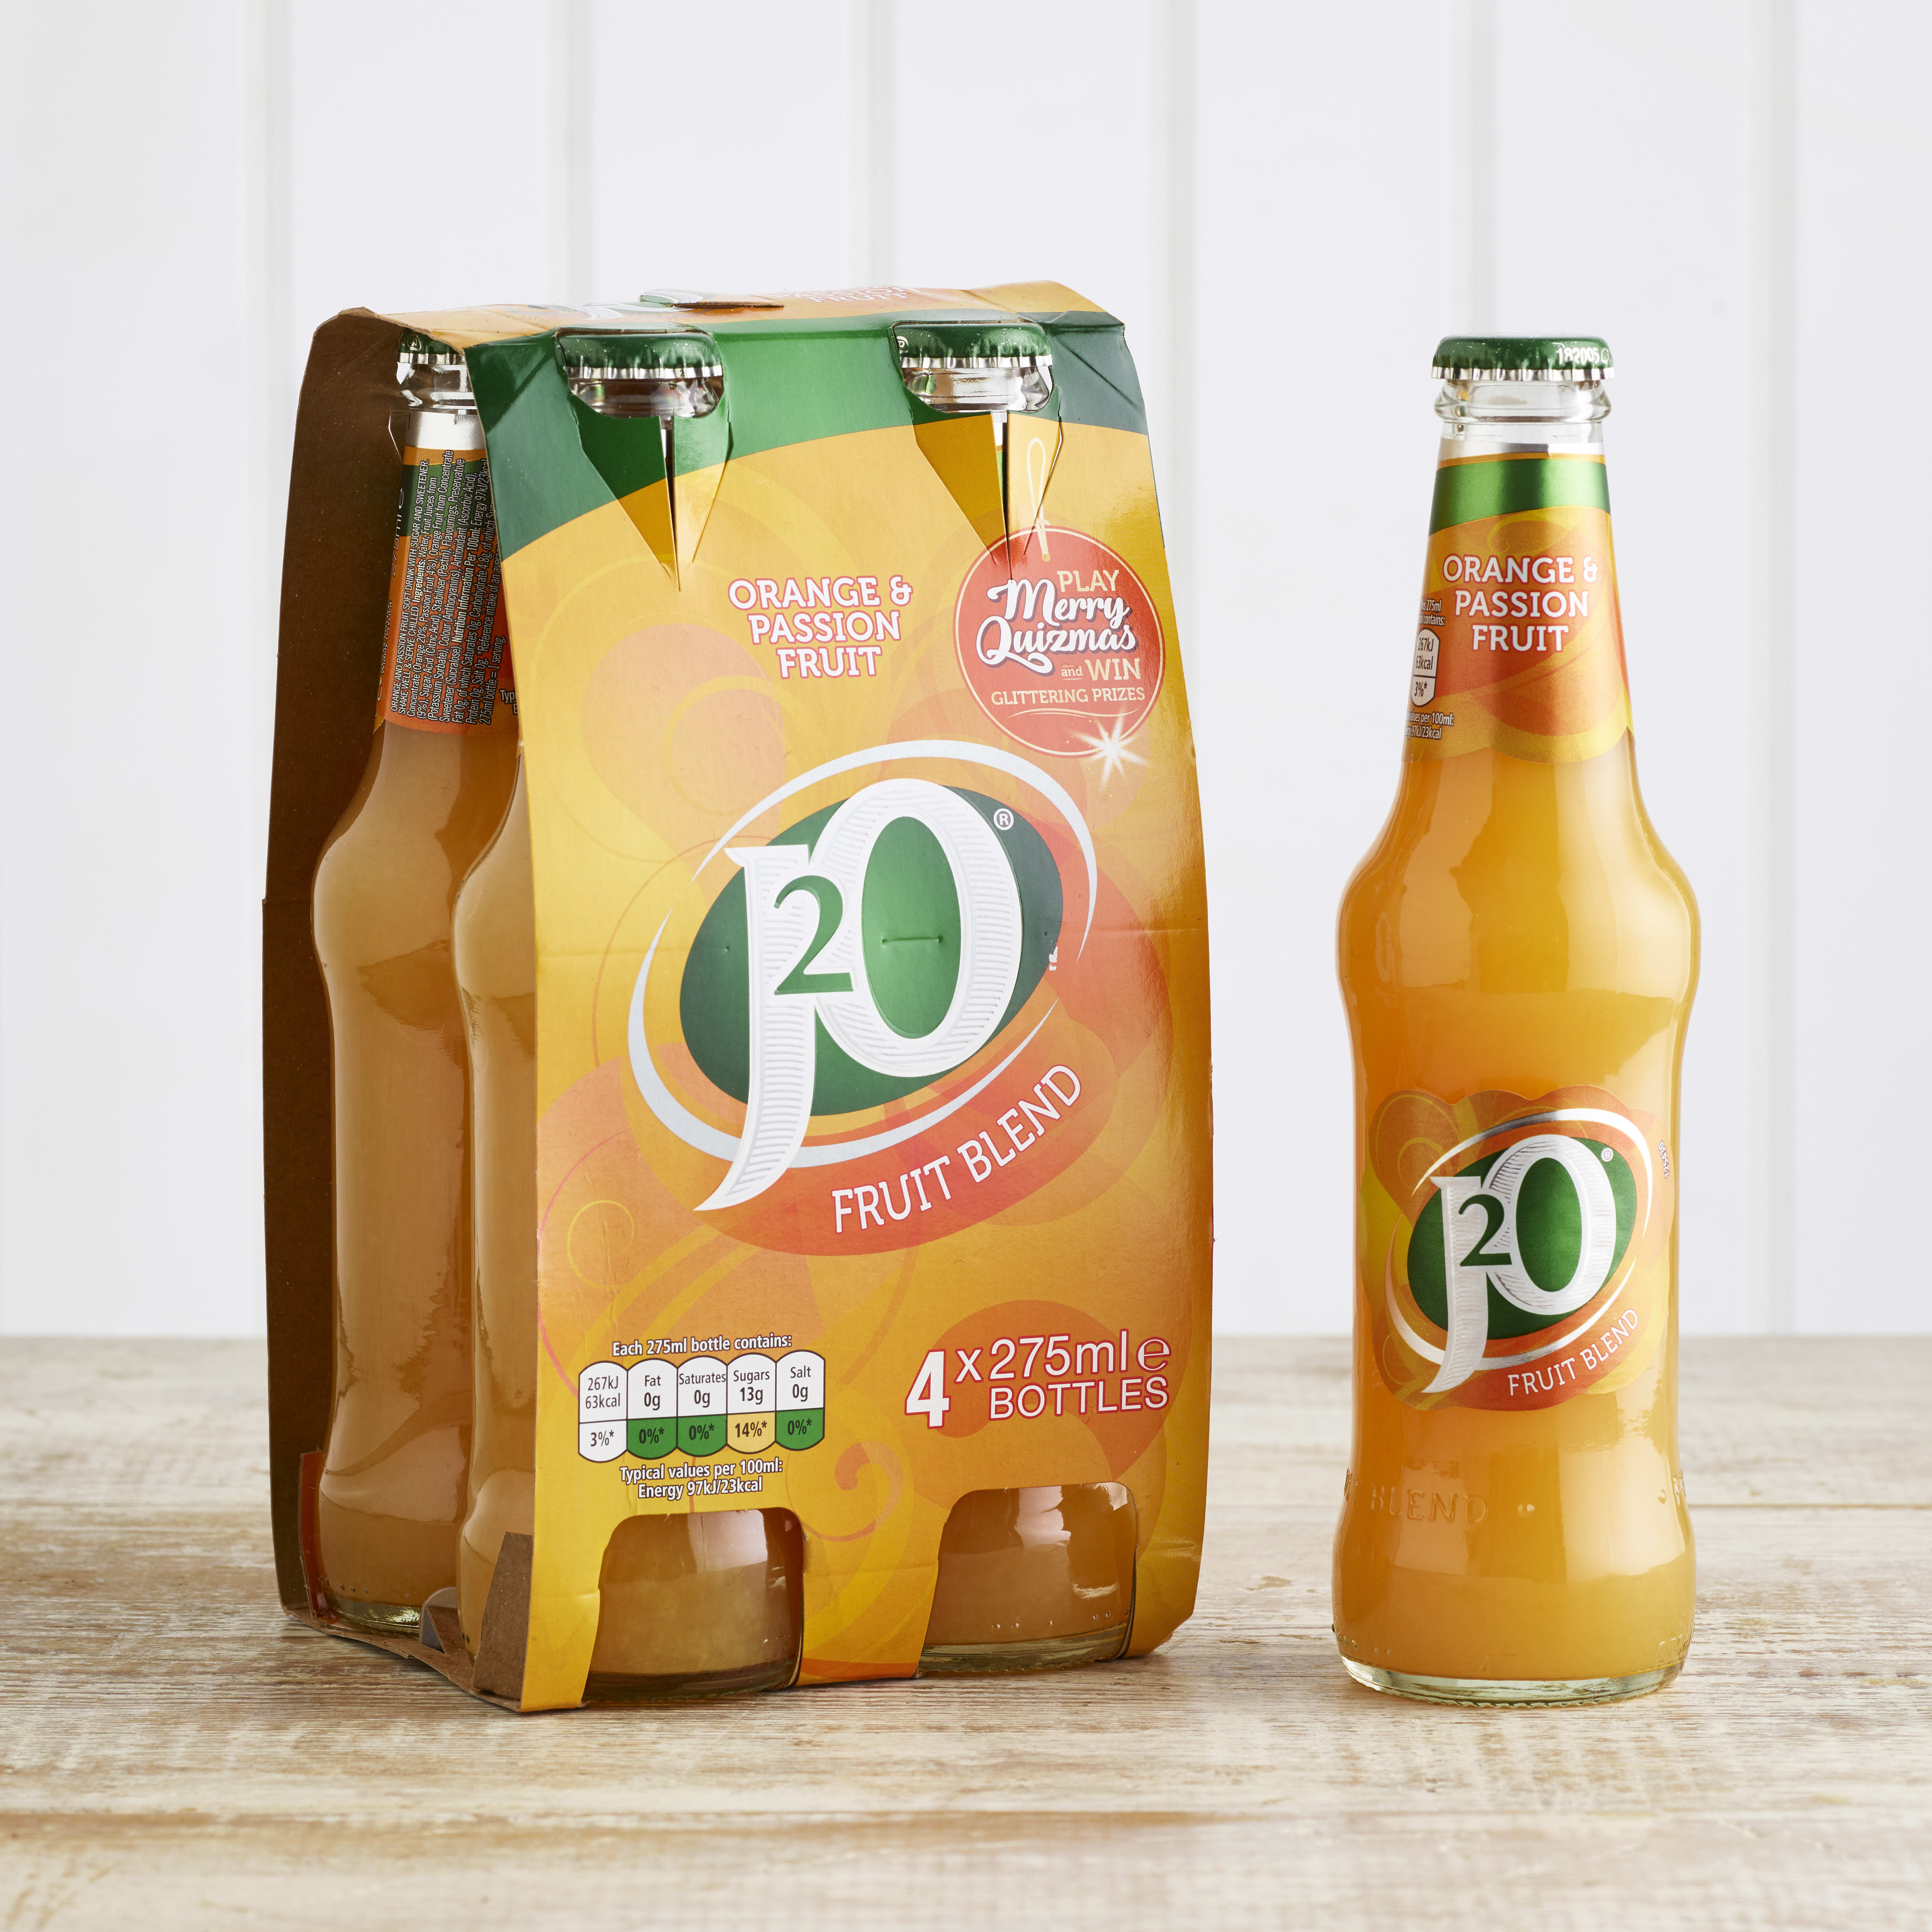 J2O Orange & Passionfruit Juice Drink, 4 x 275ml